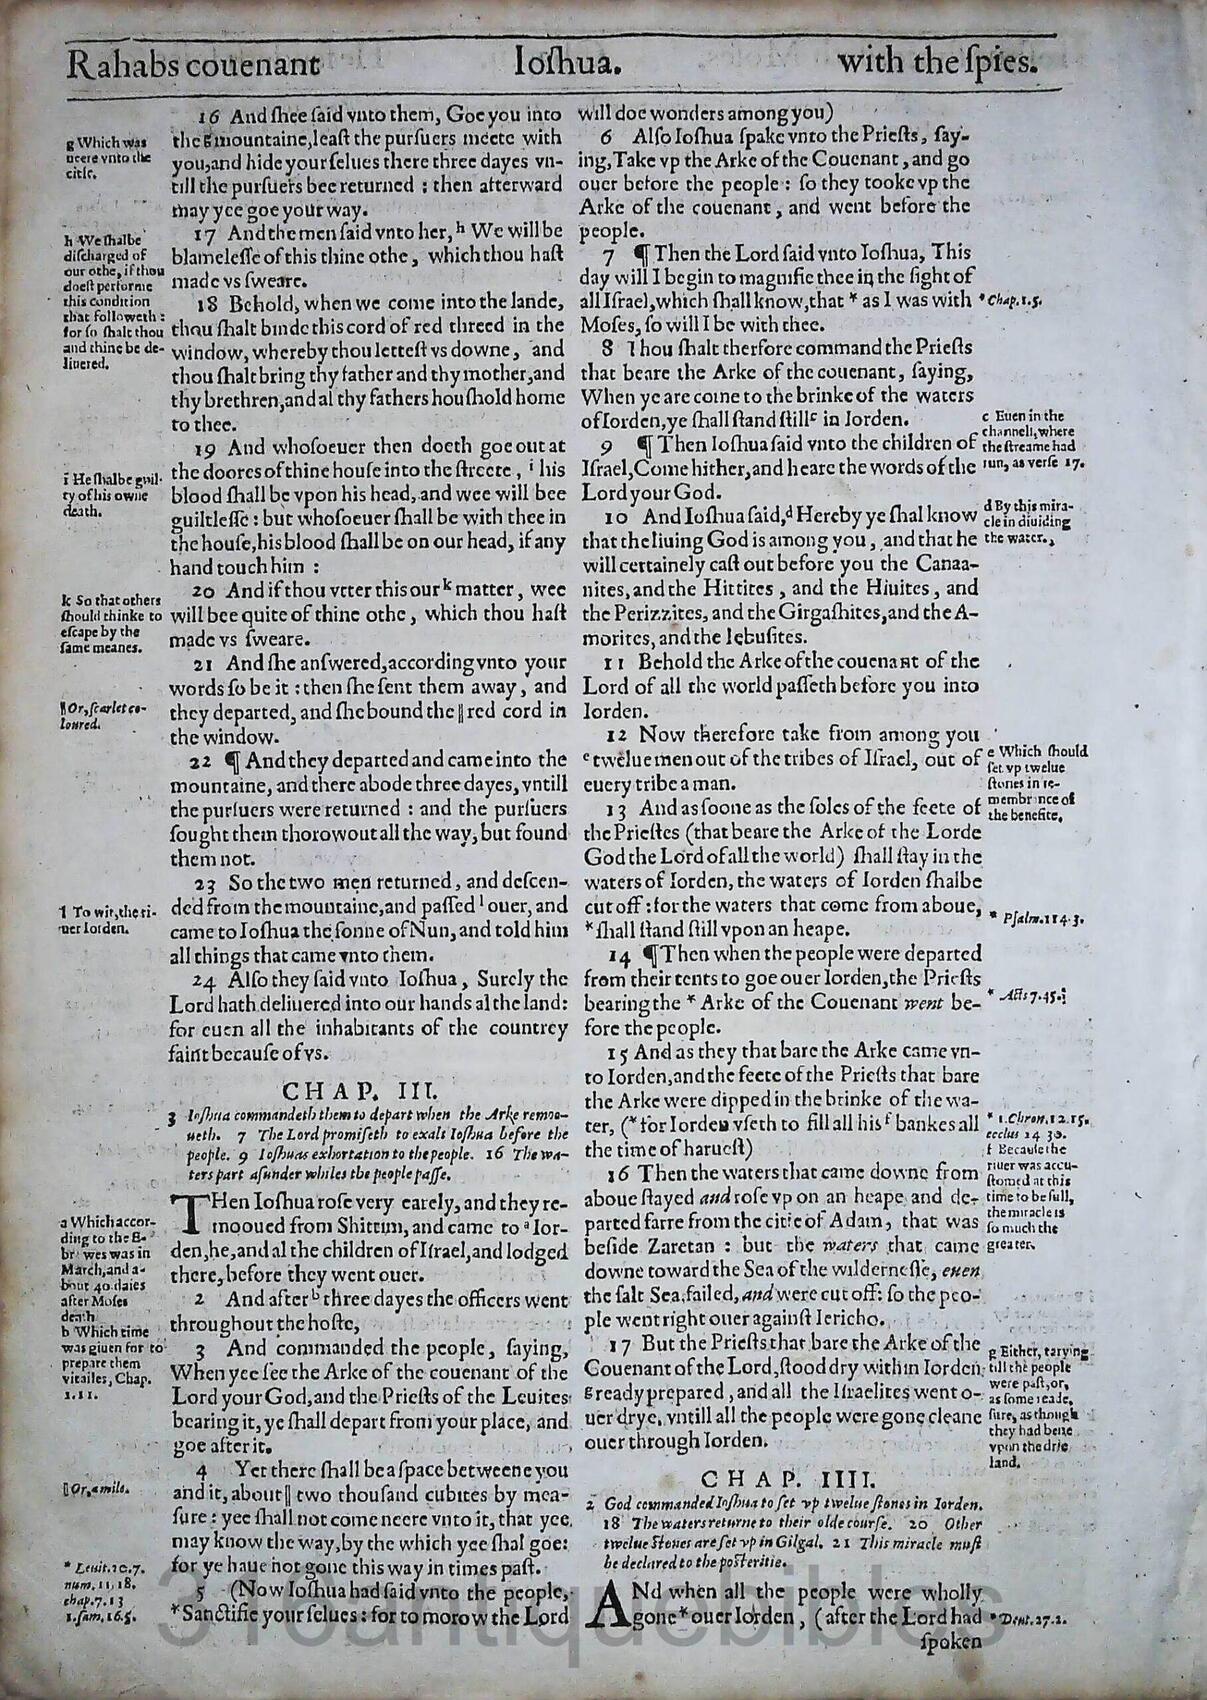 1612 GENEVA BIBLE JOSHUA LEAVES